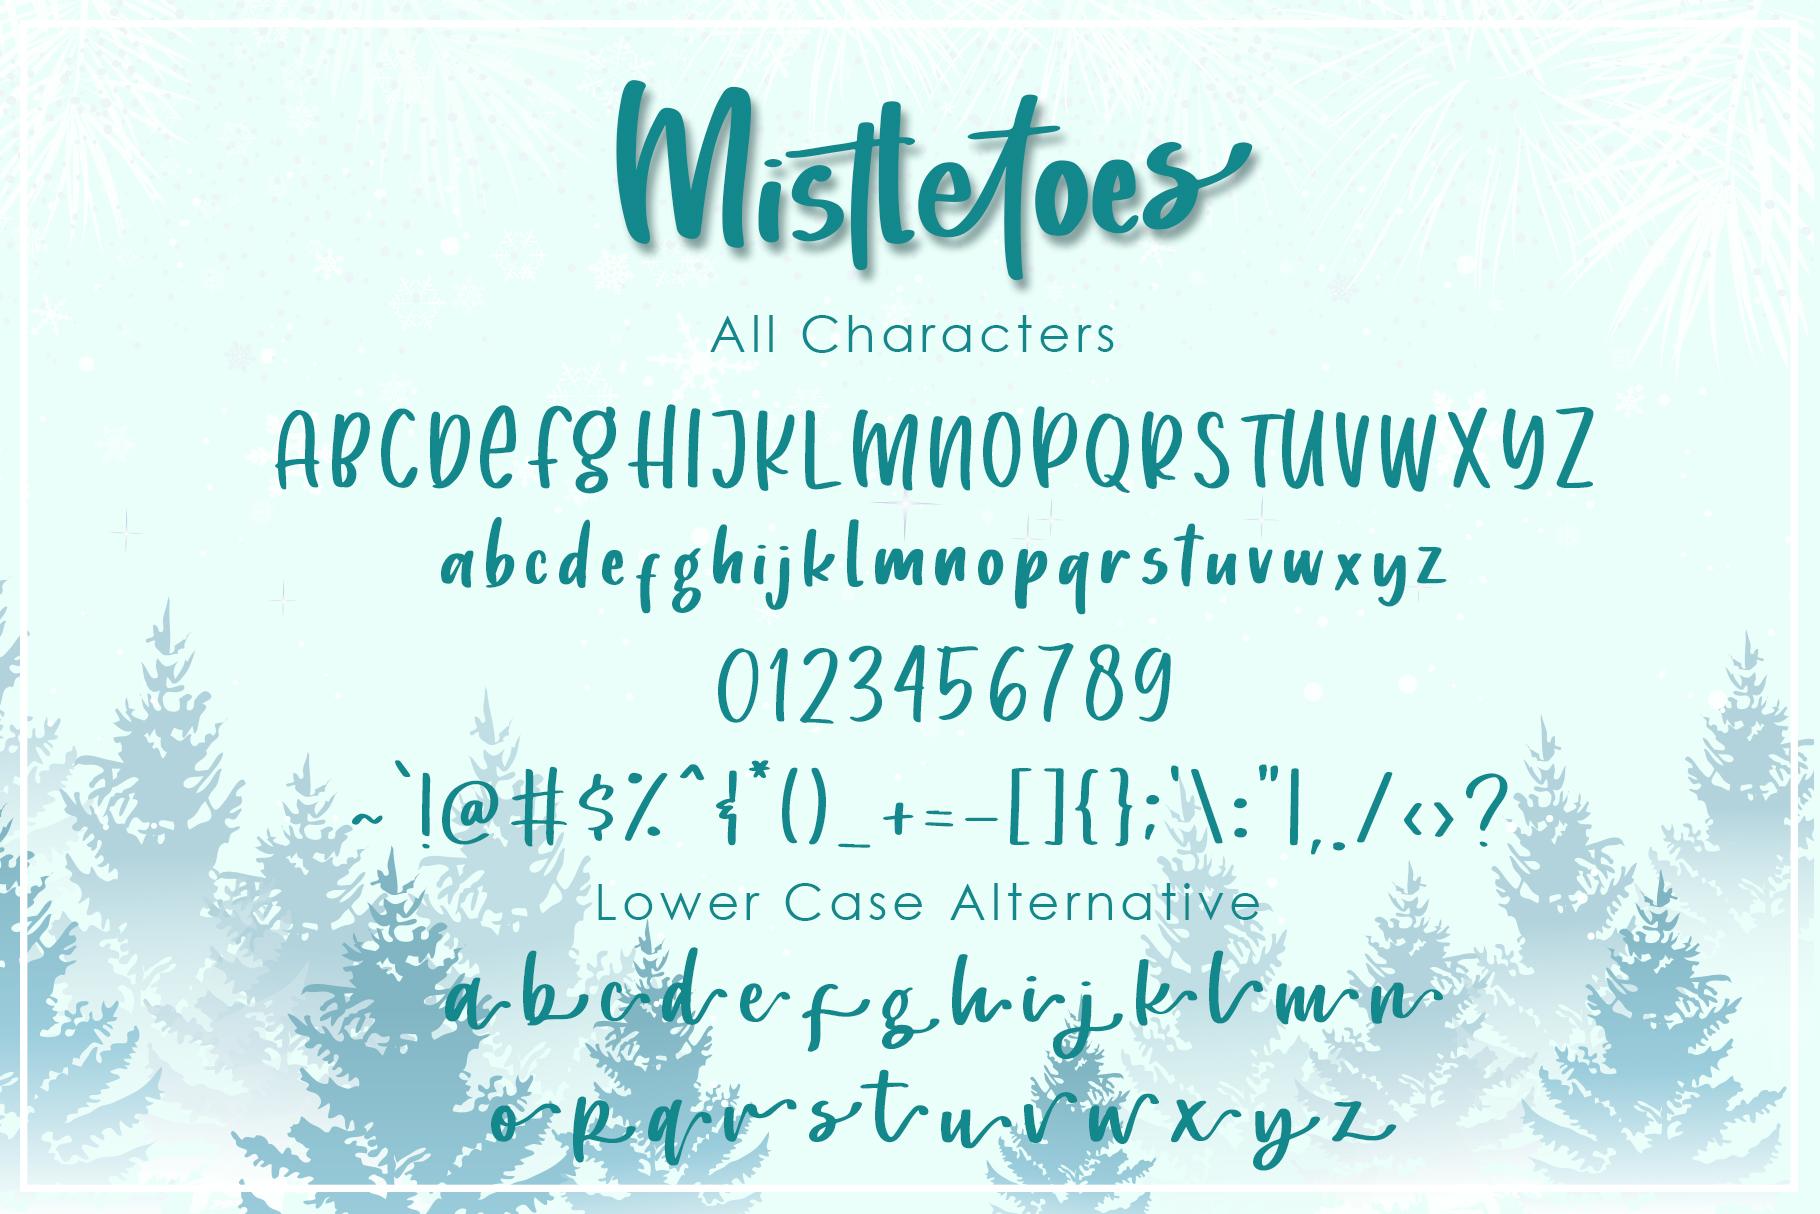 Mistletoes - Handwritten Brush Font example image 2